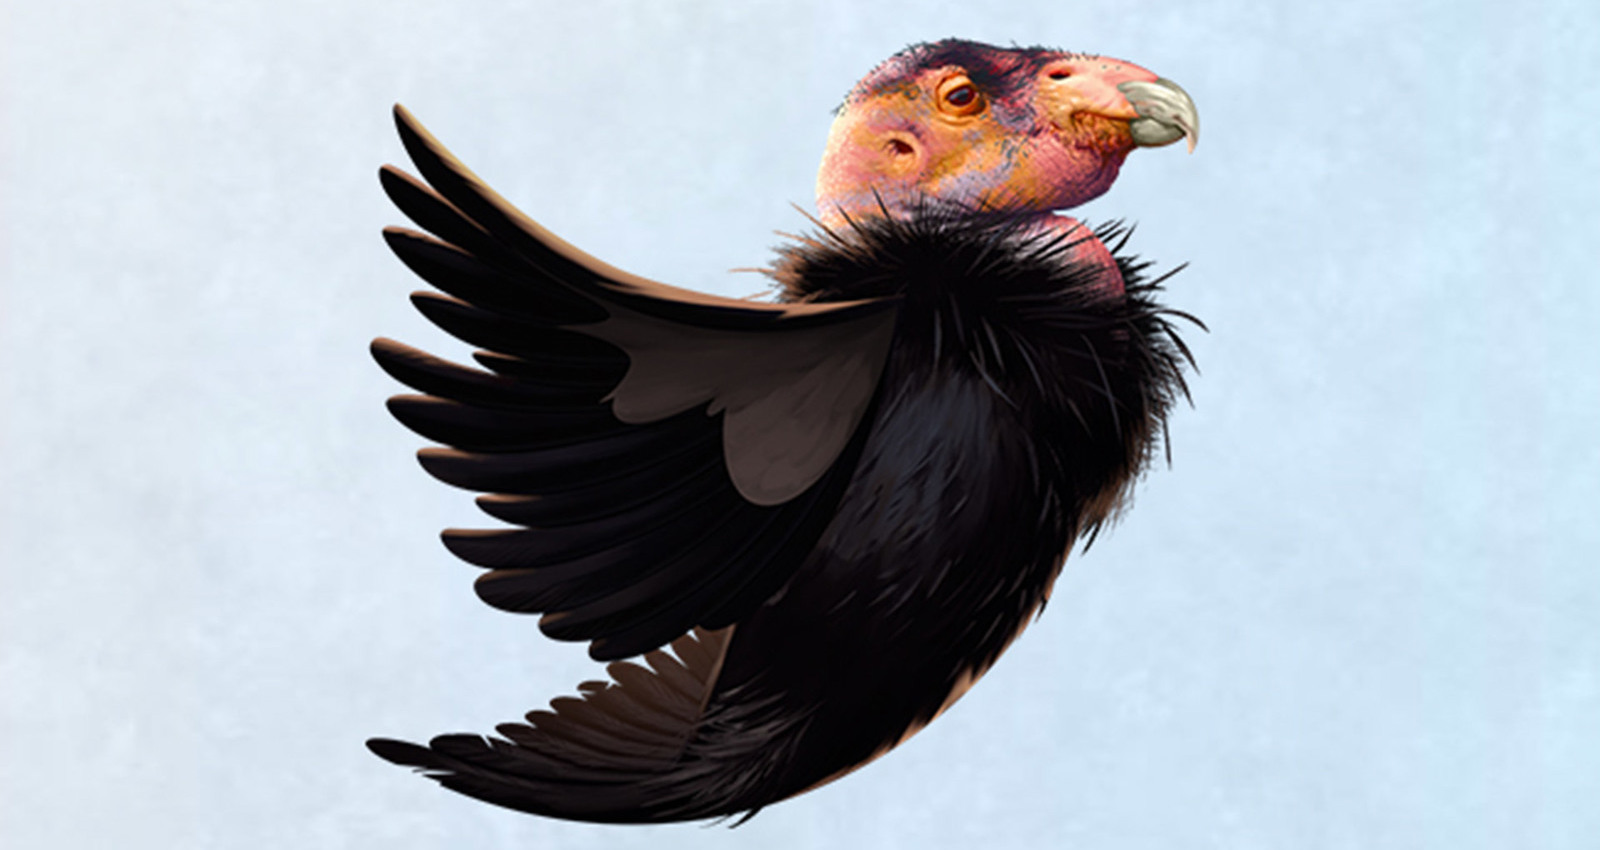 DONATE 4 BIRDS | THE NEW ECOSYSTEM